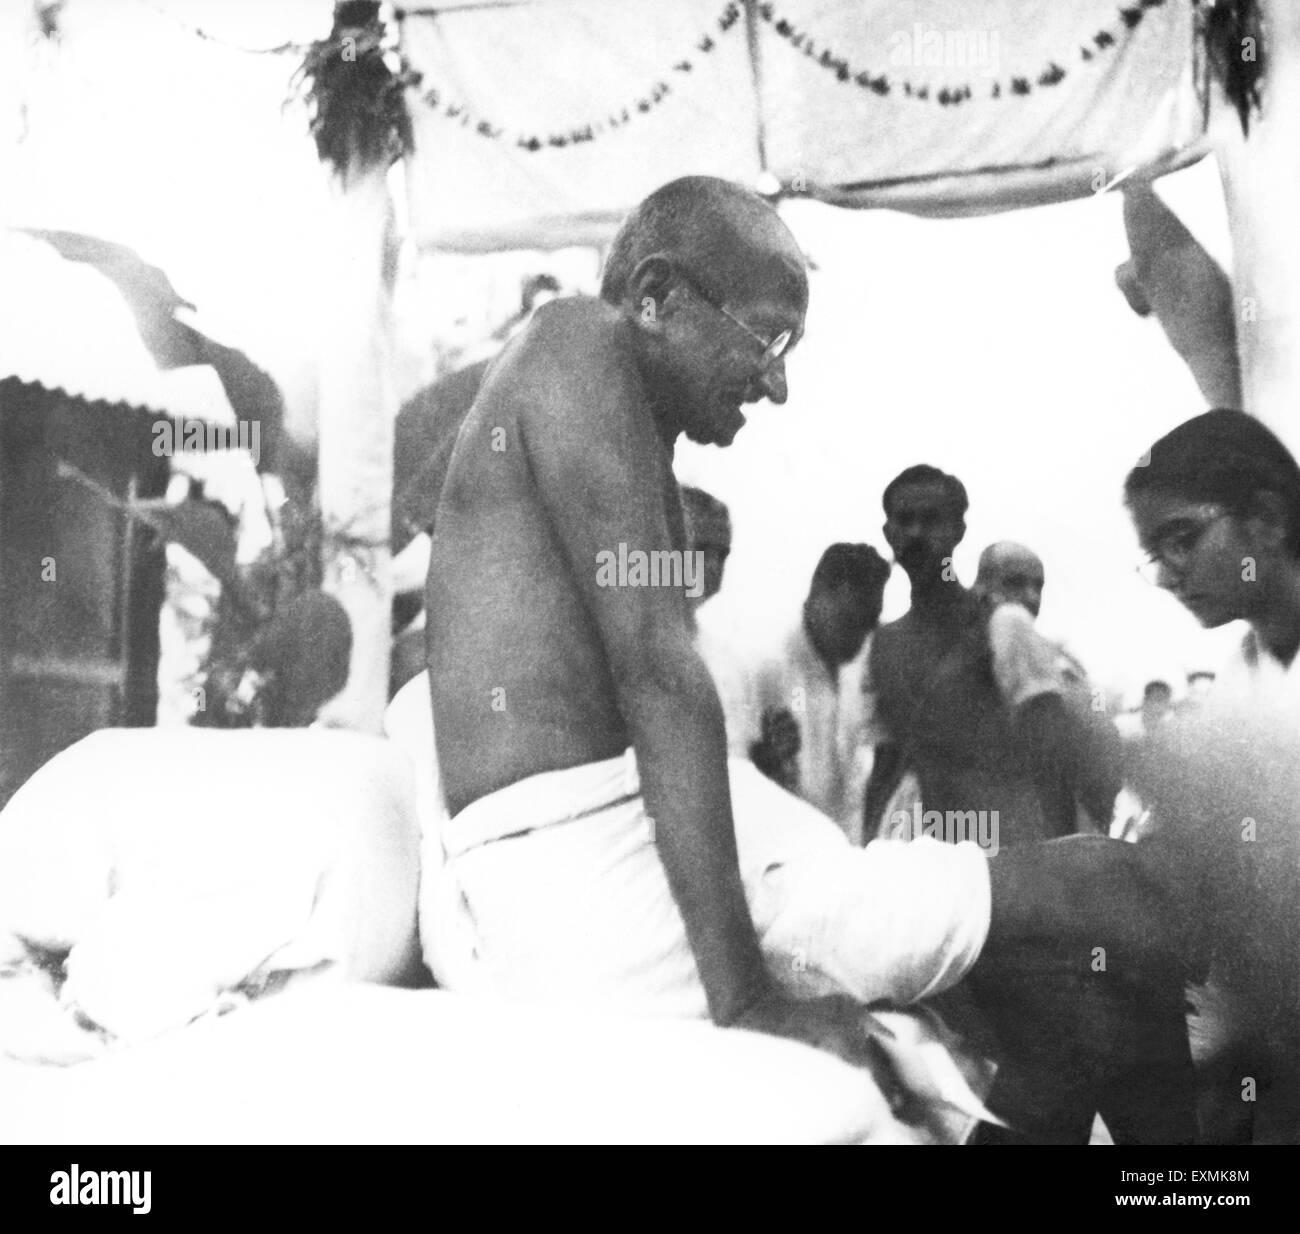 Mahatma Gandhi after a prayer meeting ; November 1946 ; India NO MR ; Manu Gandhi - Stock Image